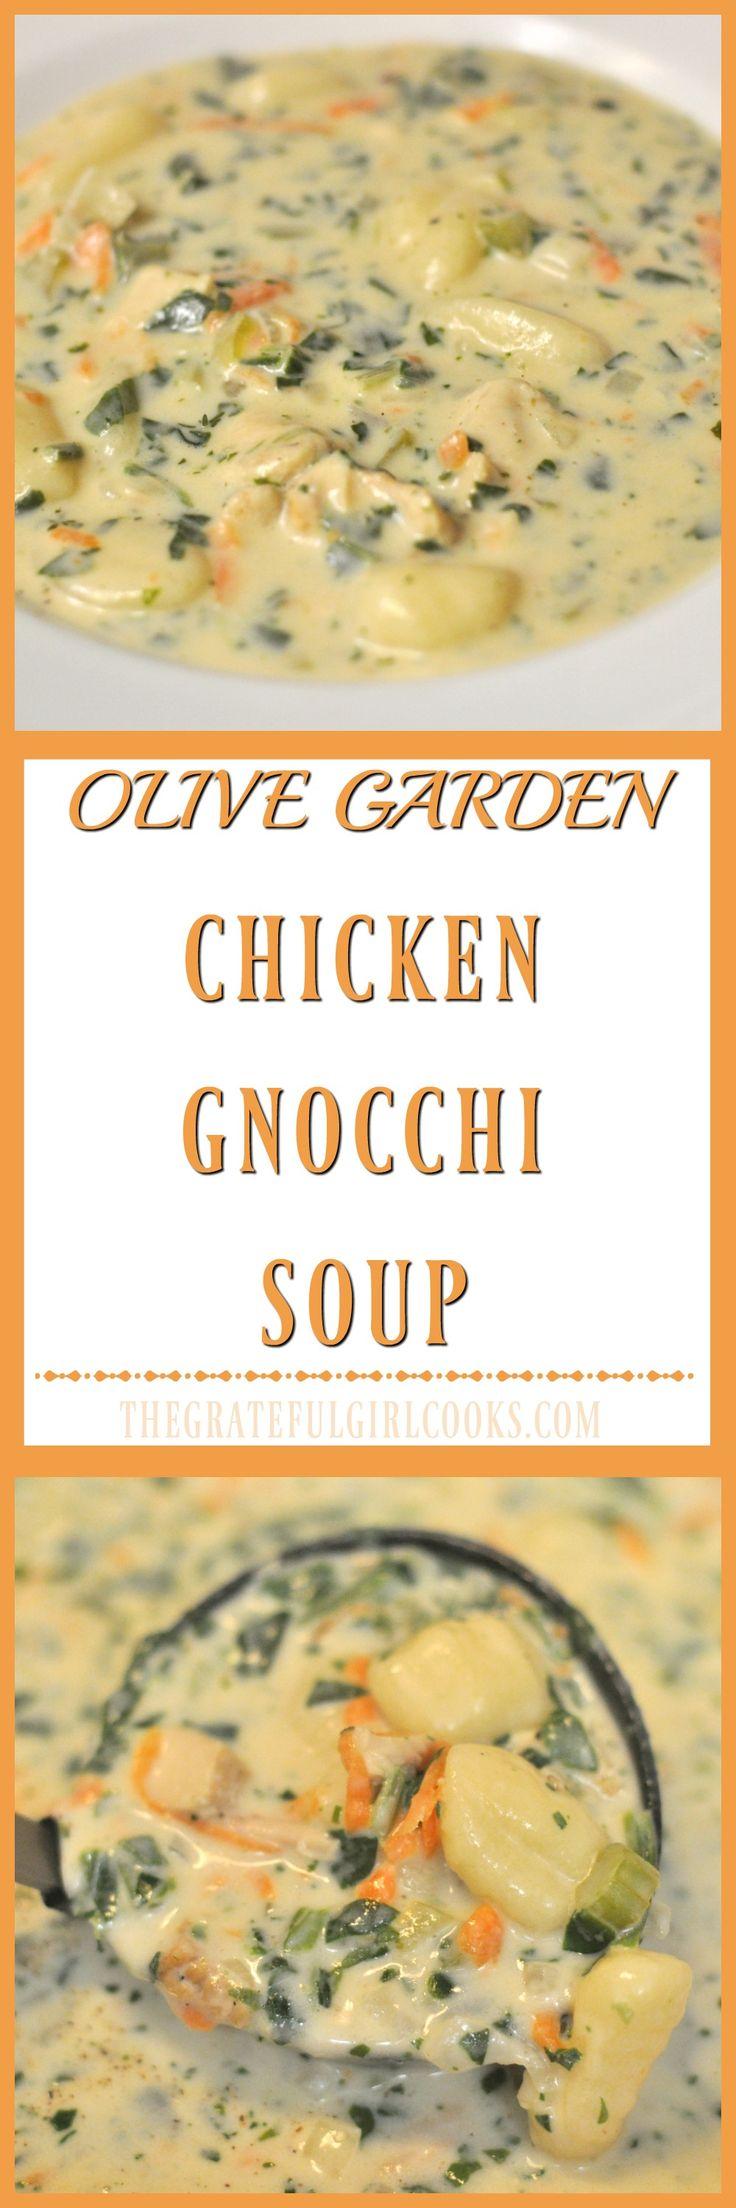 Olive Garden Chicken Gnocchi Soup / The Grateful Girl Cooks!